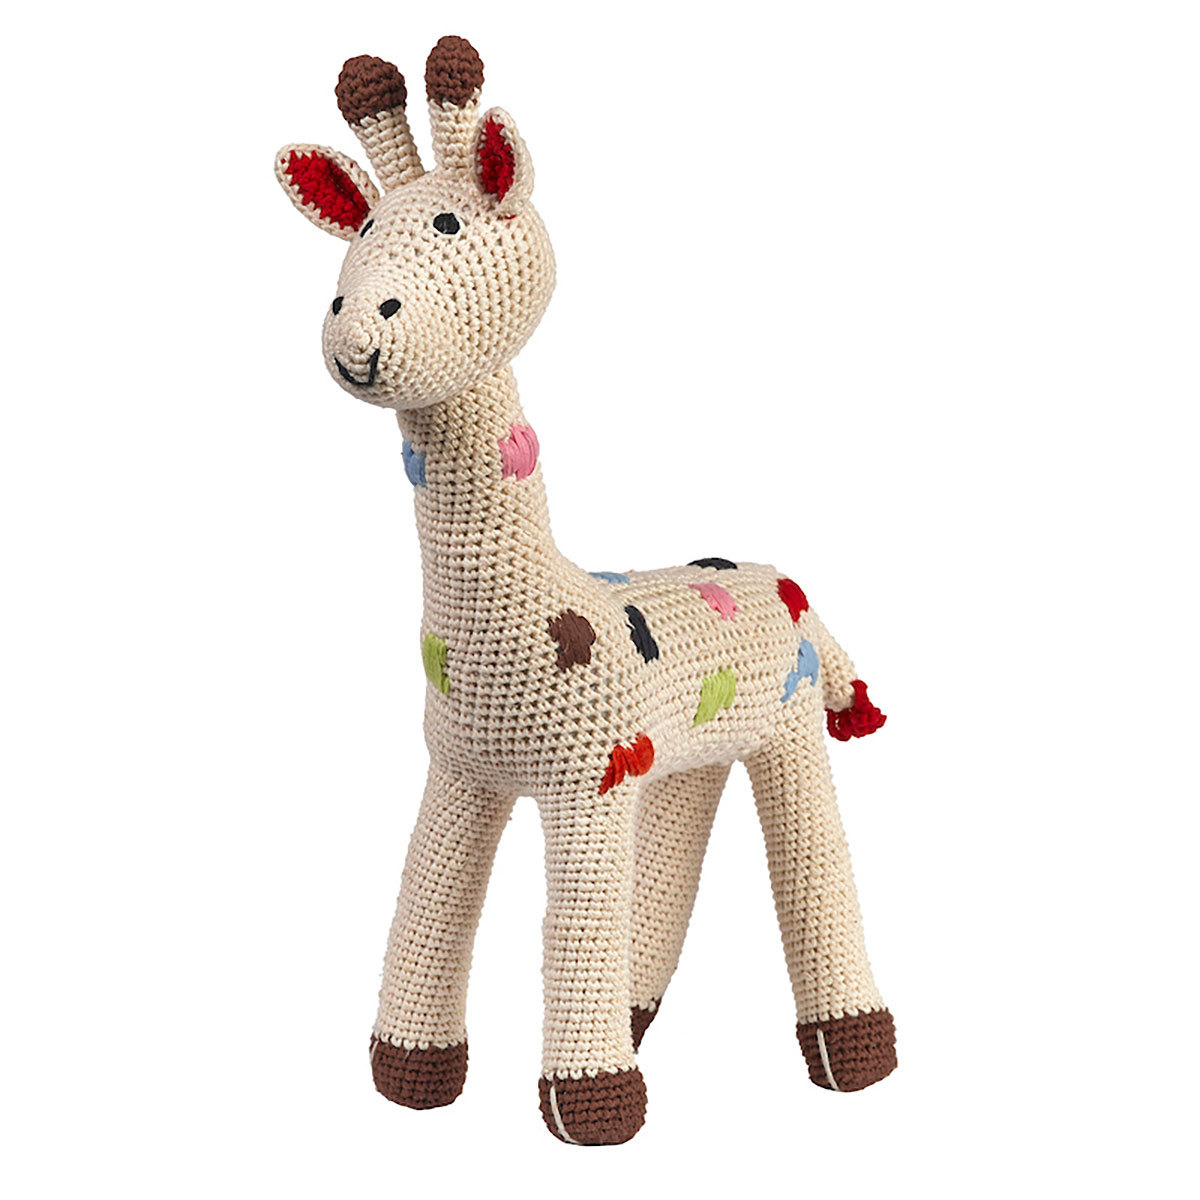 Peluche Girafe en Crochet Girafe en Crochet